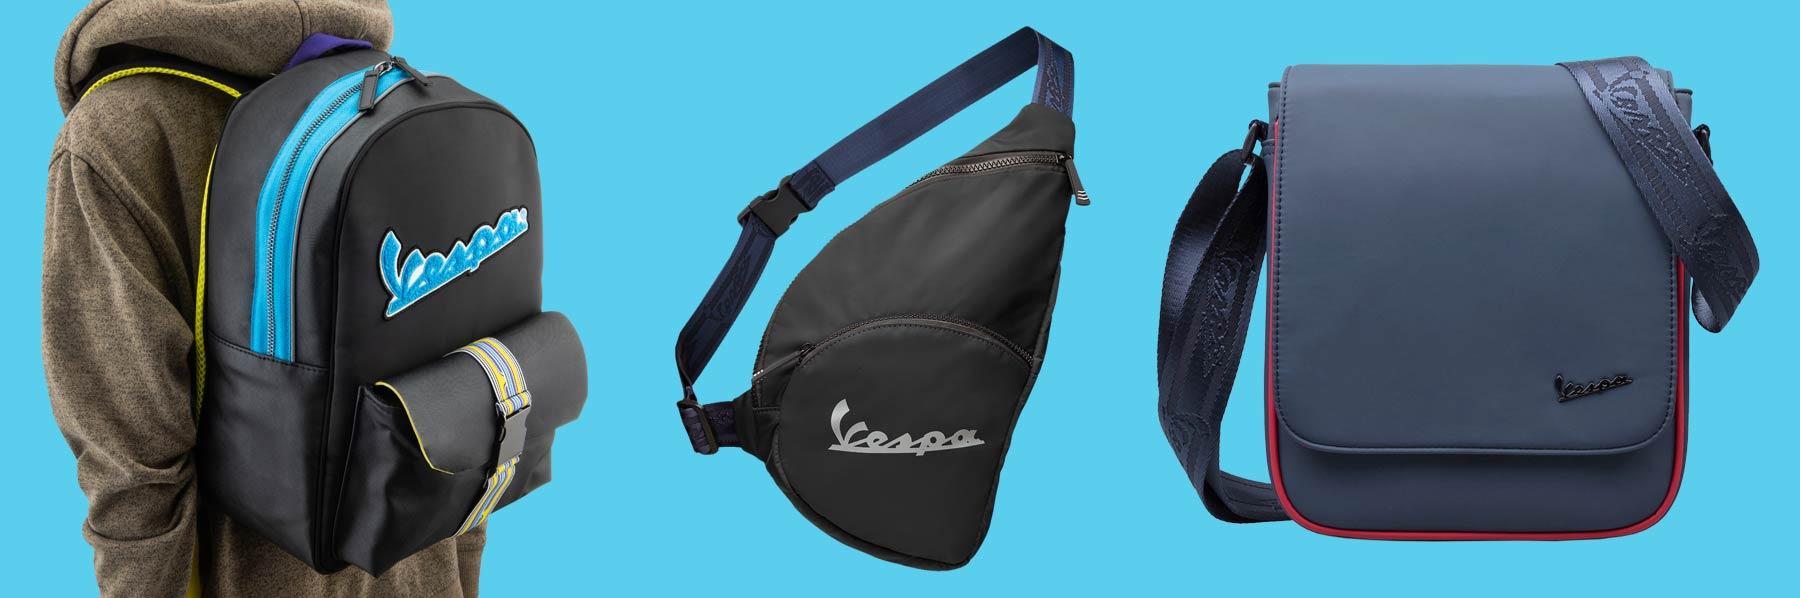 Vespa Bags and Backpacks